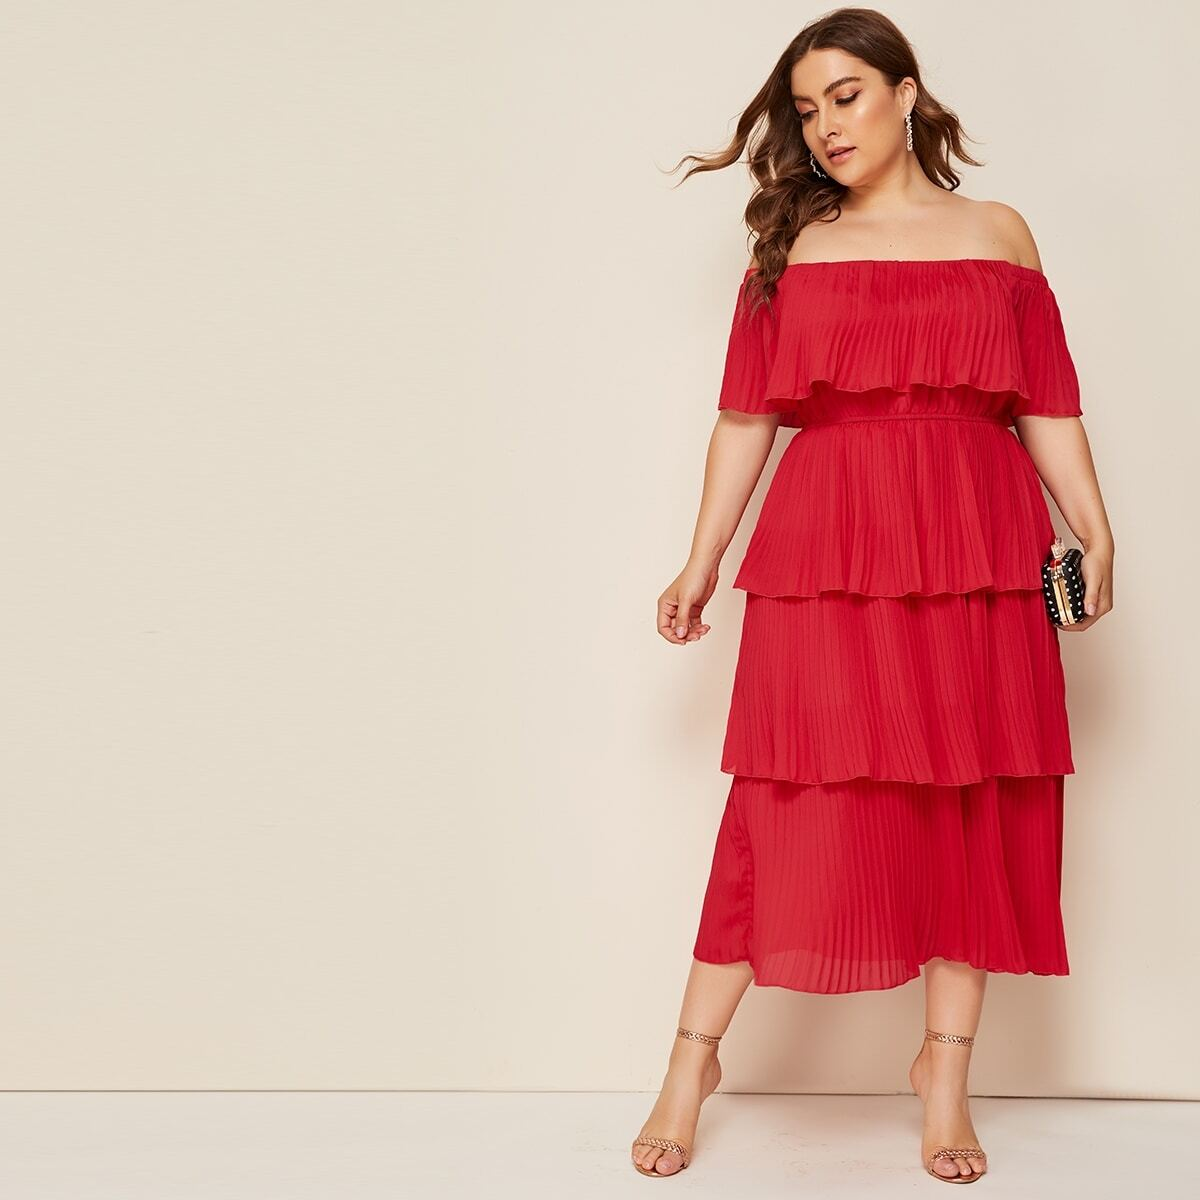 Rood Elegant Vlak Grote maten jurken Laagjes